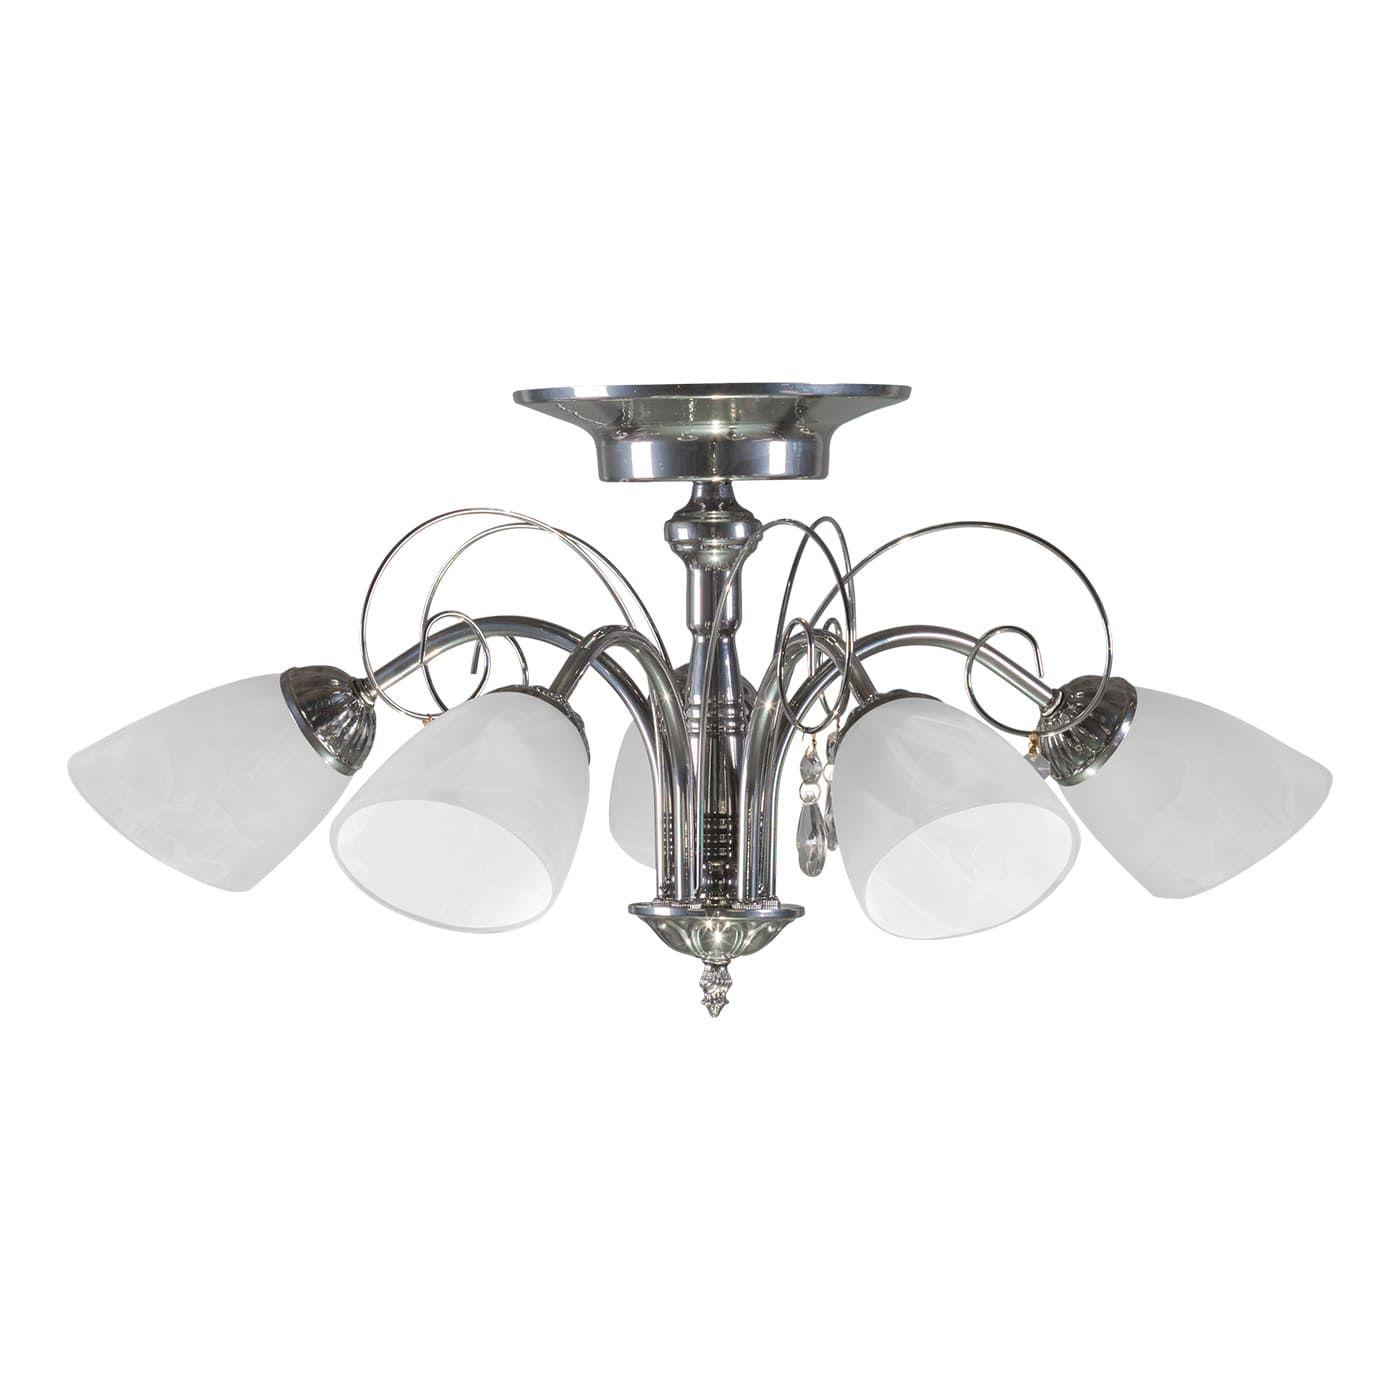 PETRASVET / Ceiling chandelier S2107-5, 5xE14 max. 60W